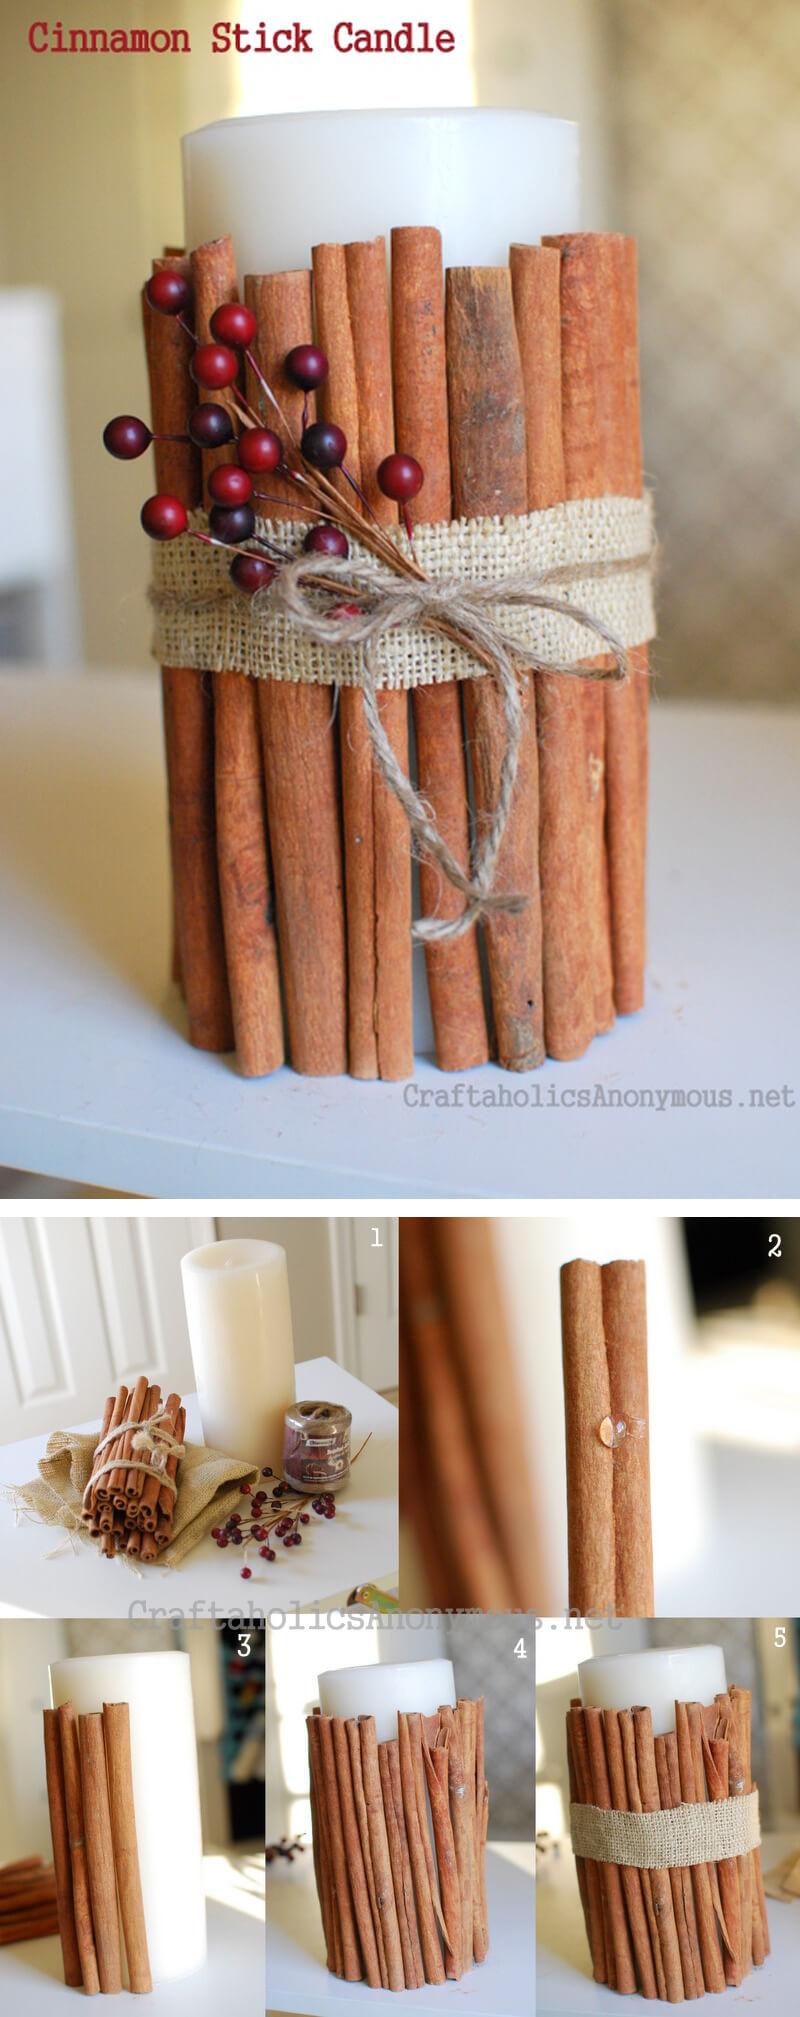 Classy Cinnamon Stick Decorated Candle